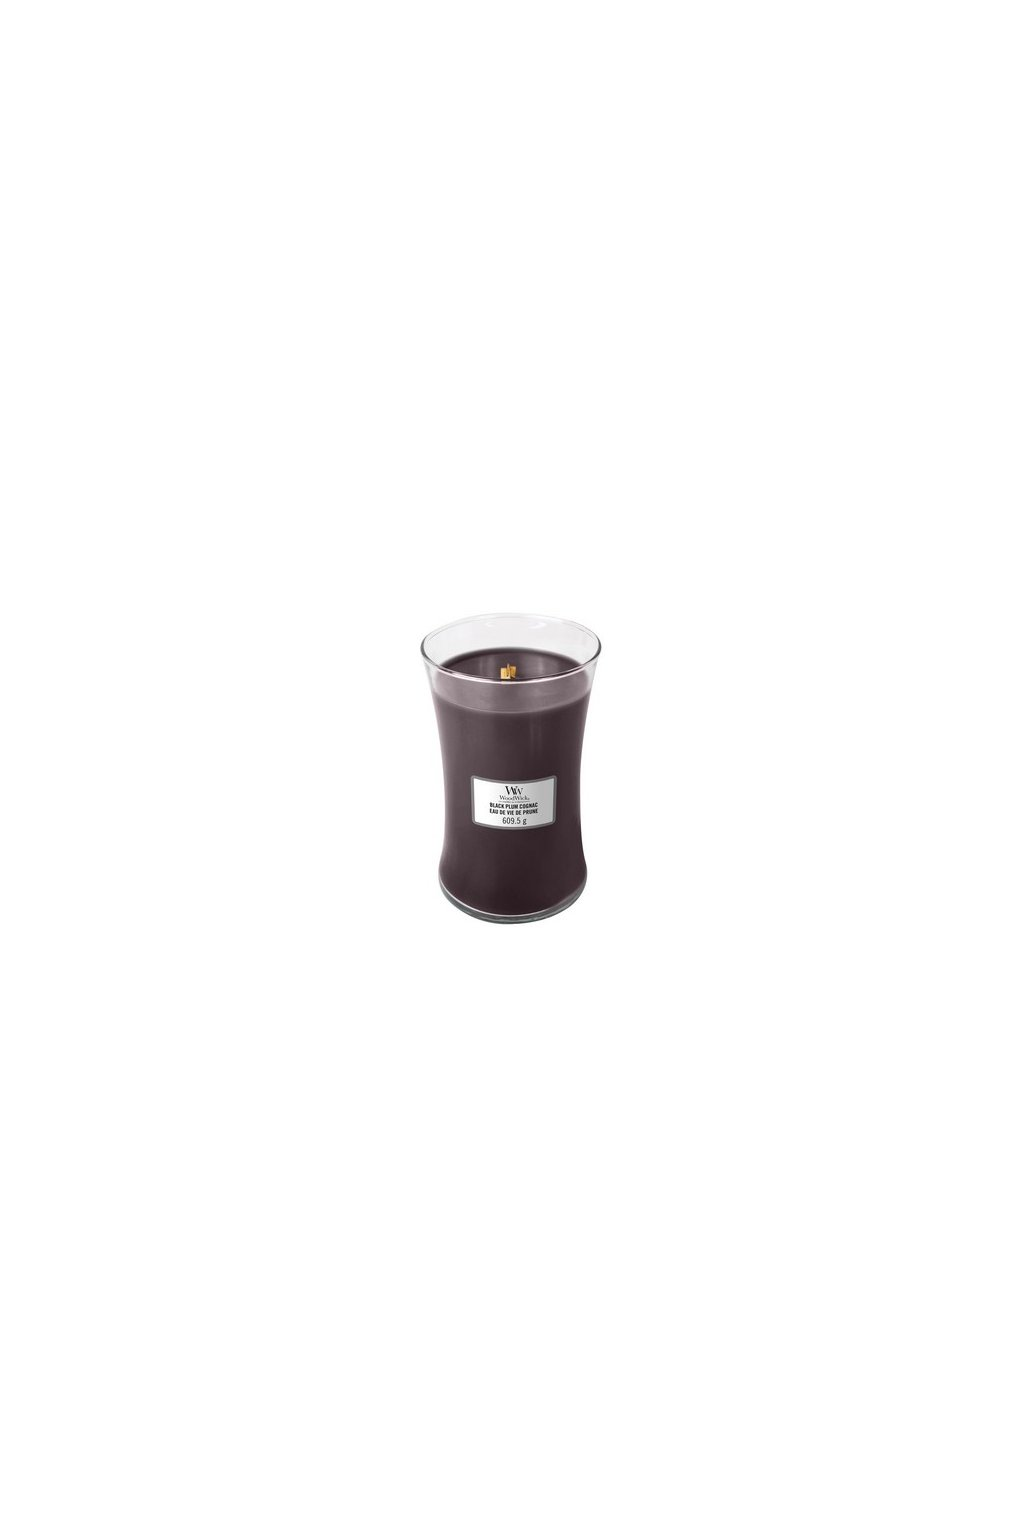 Woodwick Black Plum Cognac 609g